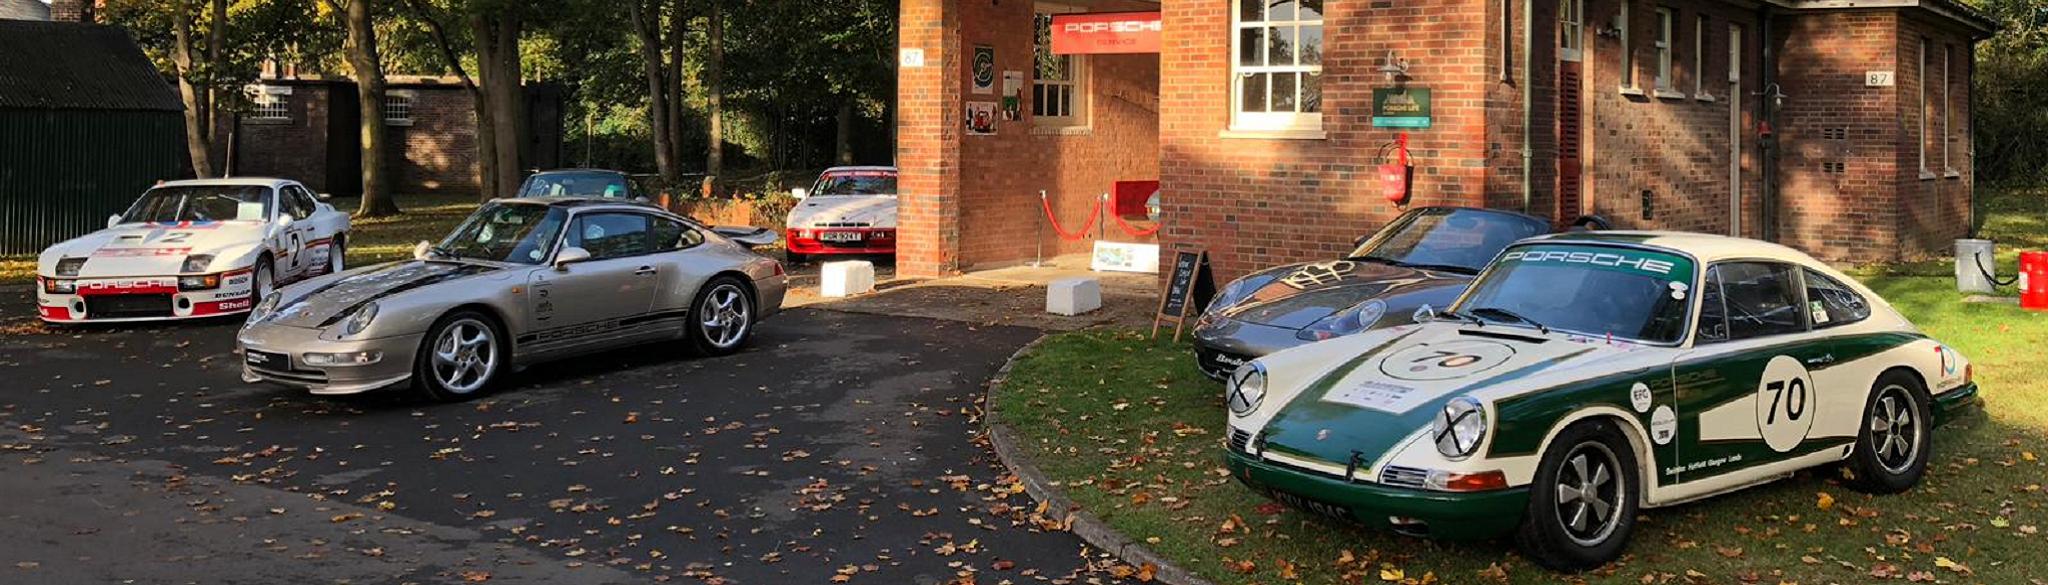 Porsche Classic Life Centre